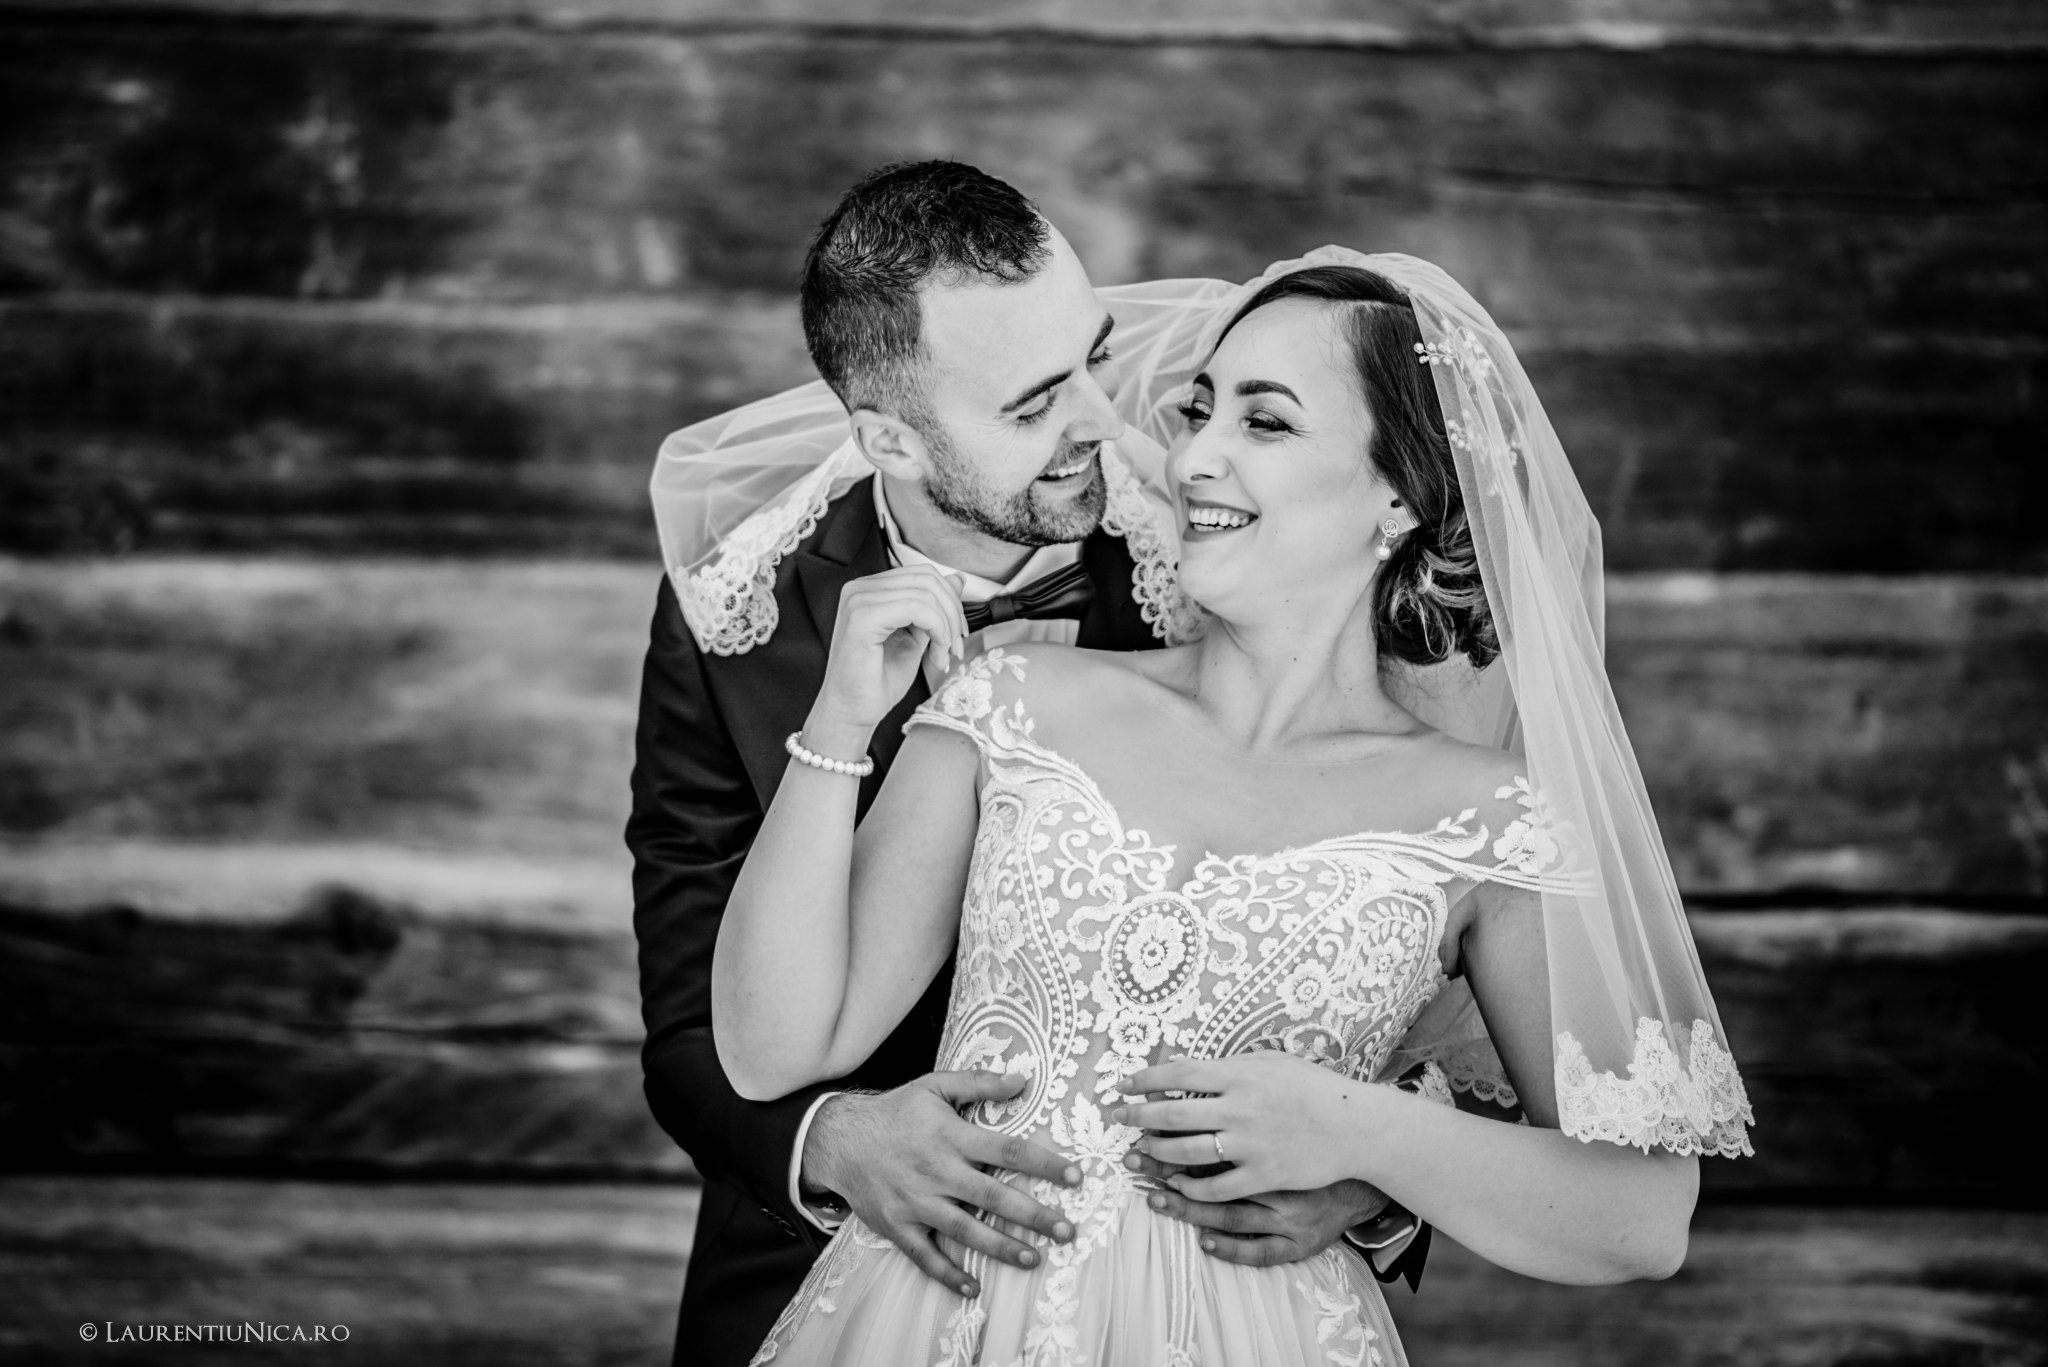 daiana si madalin fotograf nunta laurentiu nica targu jiu gorj 18 - Daiana & Madalin | Fotografii nunta | Targu-Jiu | Gorj